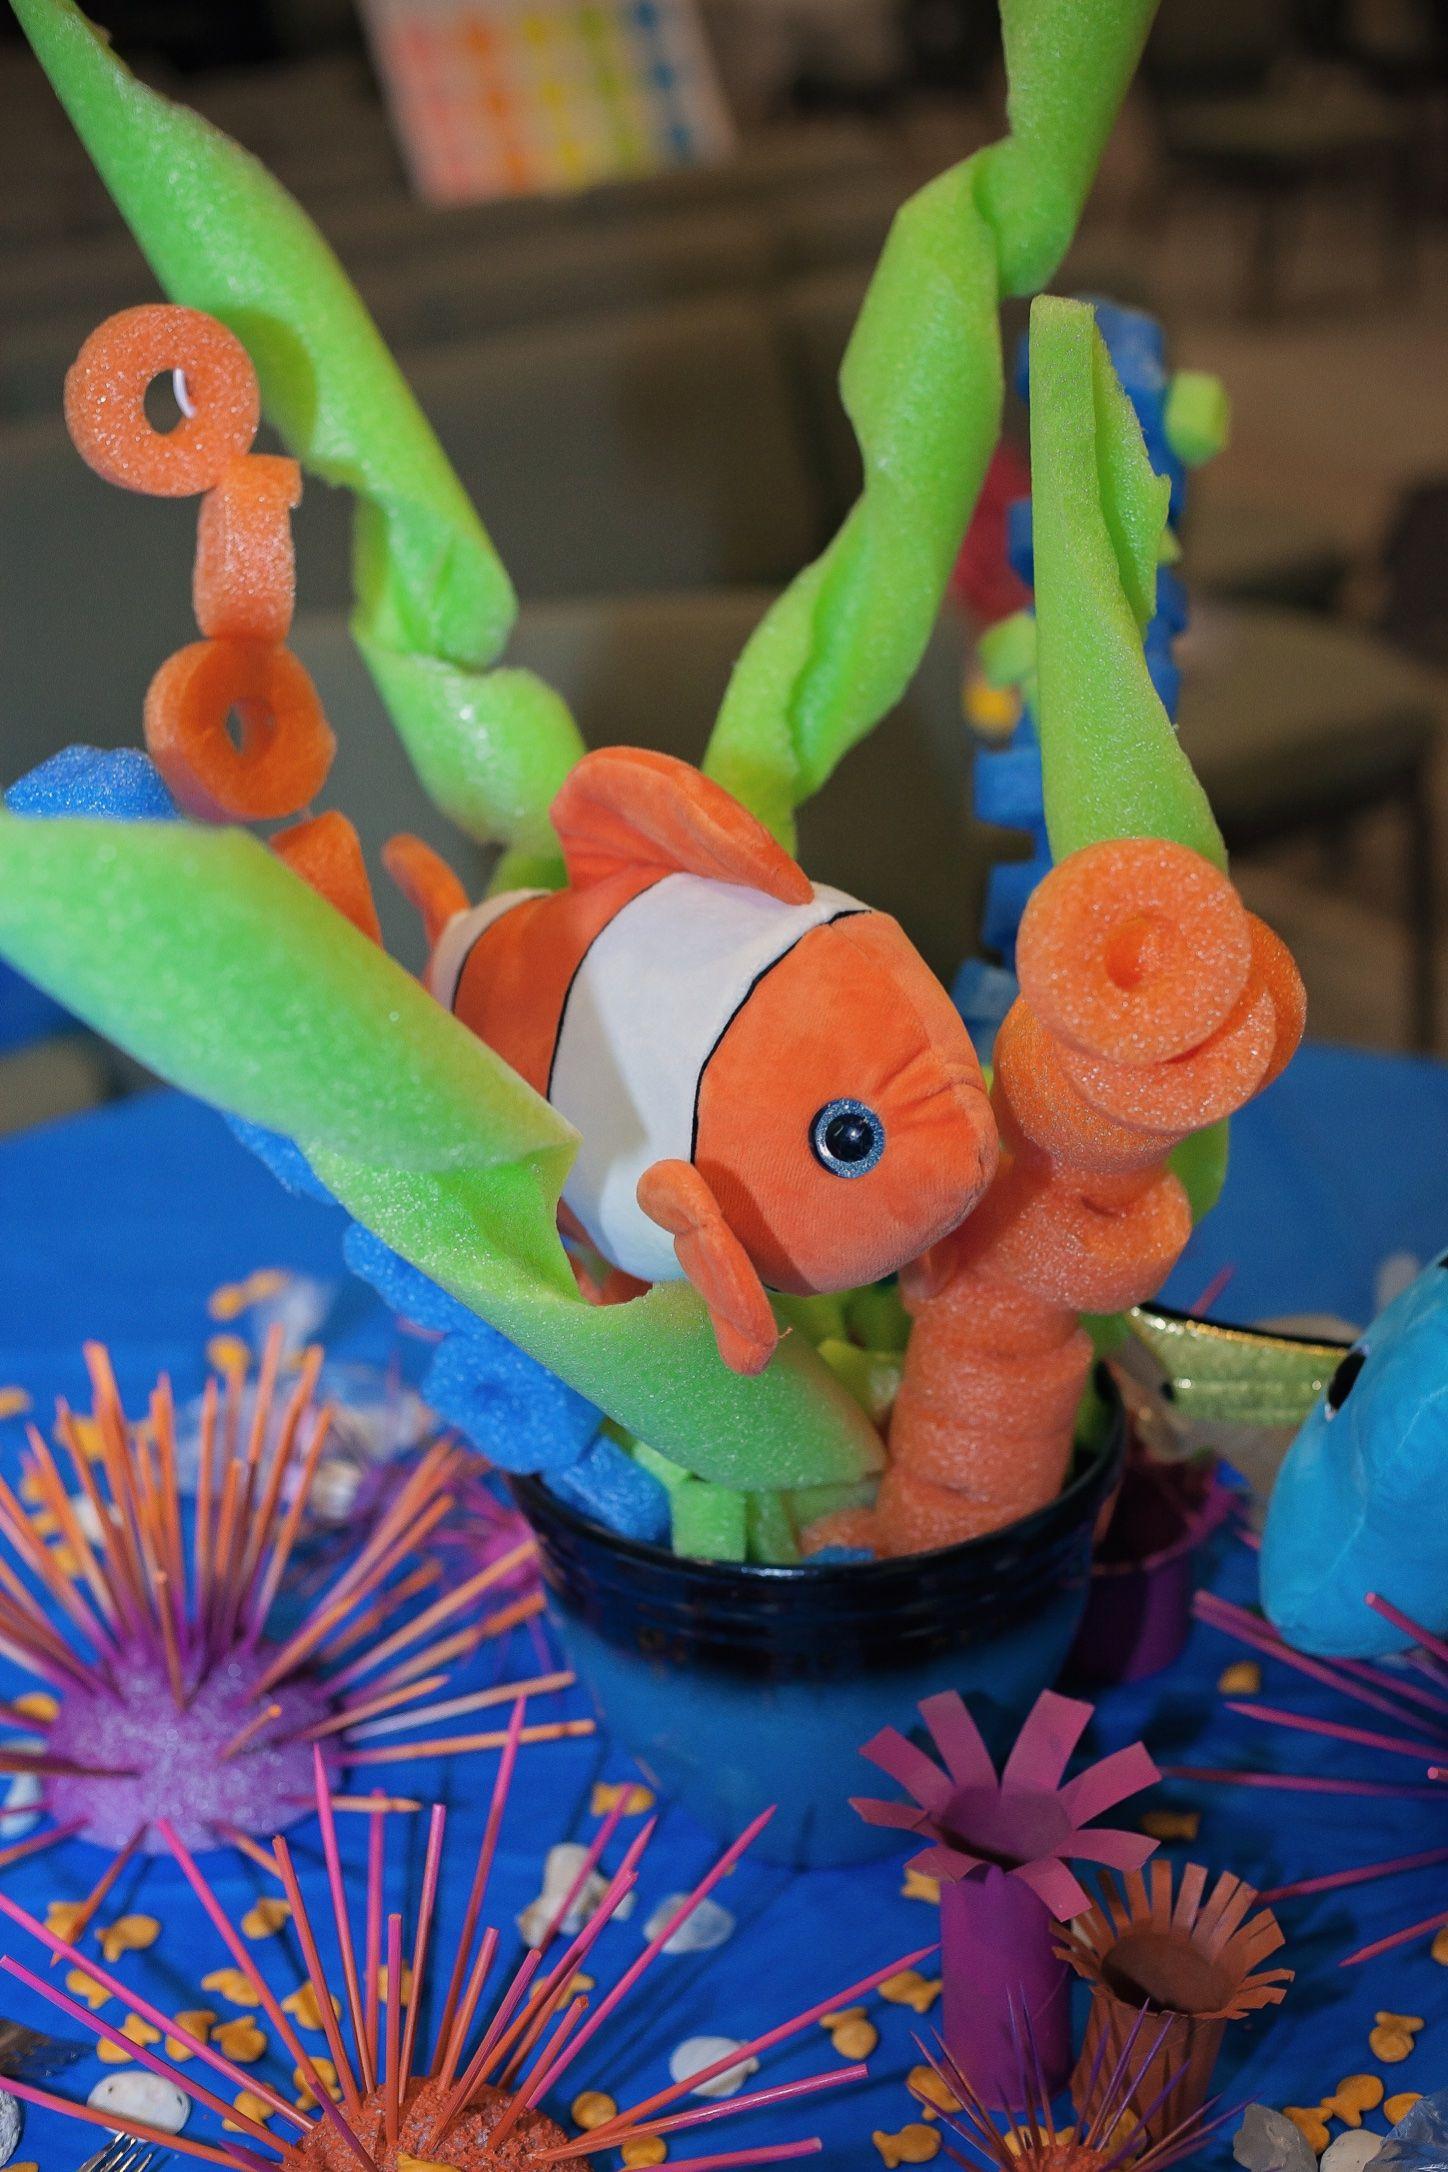 Finding nemo center piece decorations Disney theme